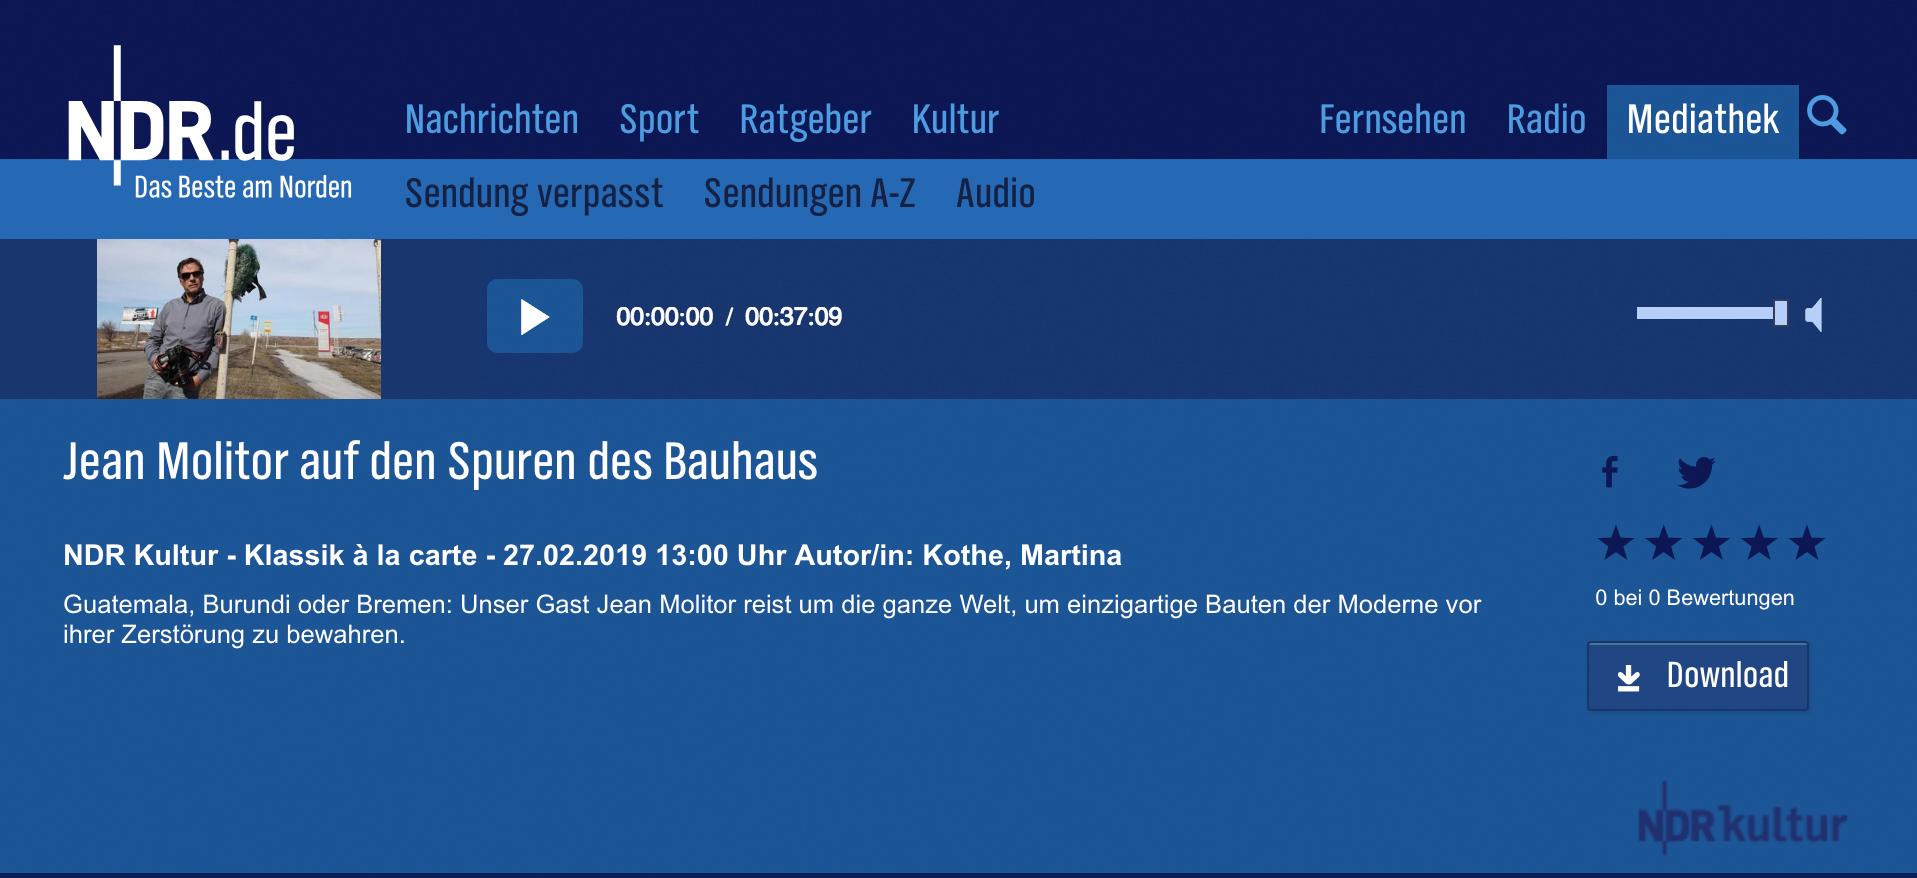 NDR_Kulturradio.jpg